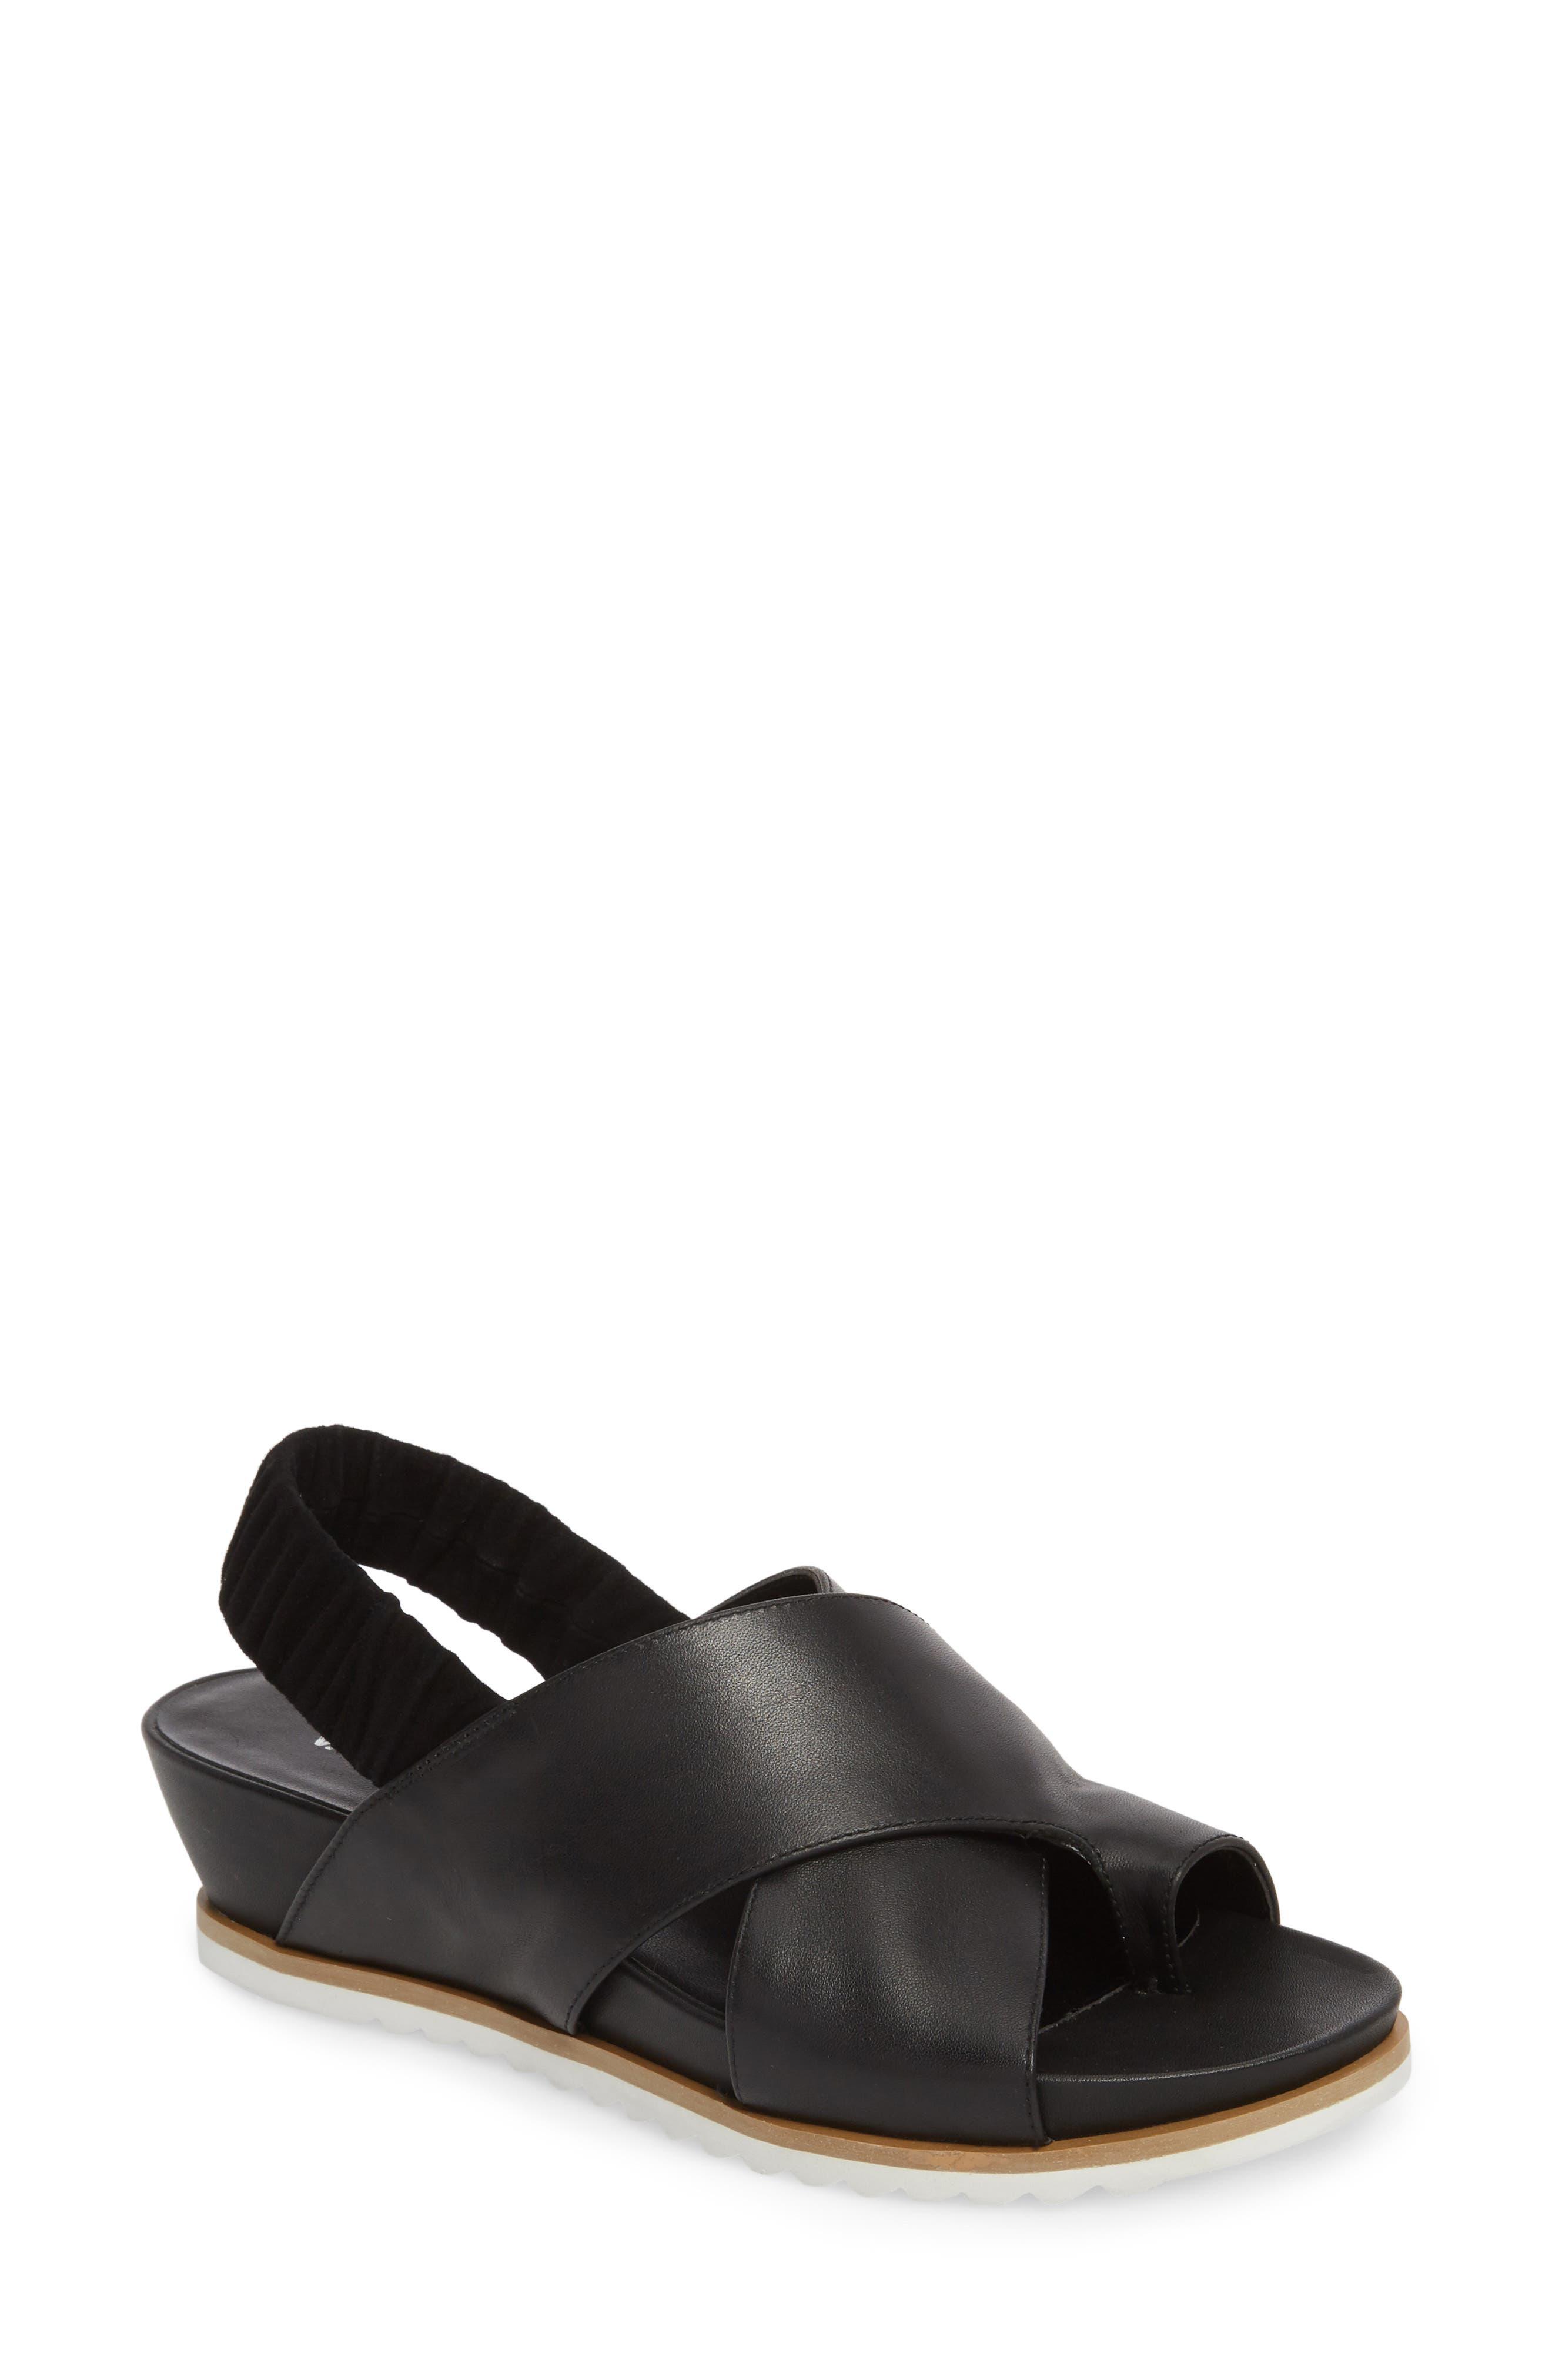 Hendra Slingback Sandal,                         Main,                         color,